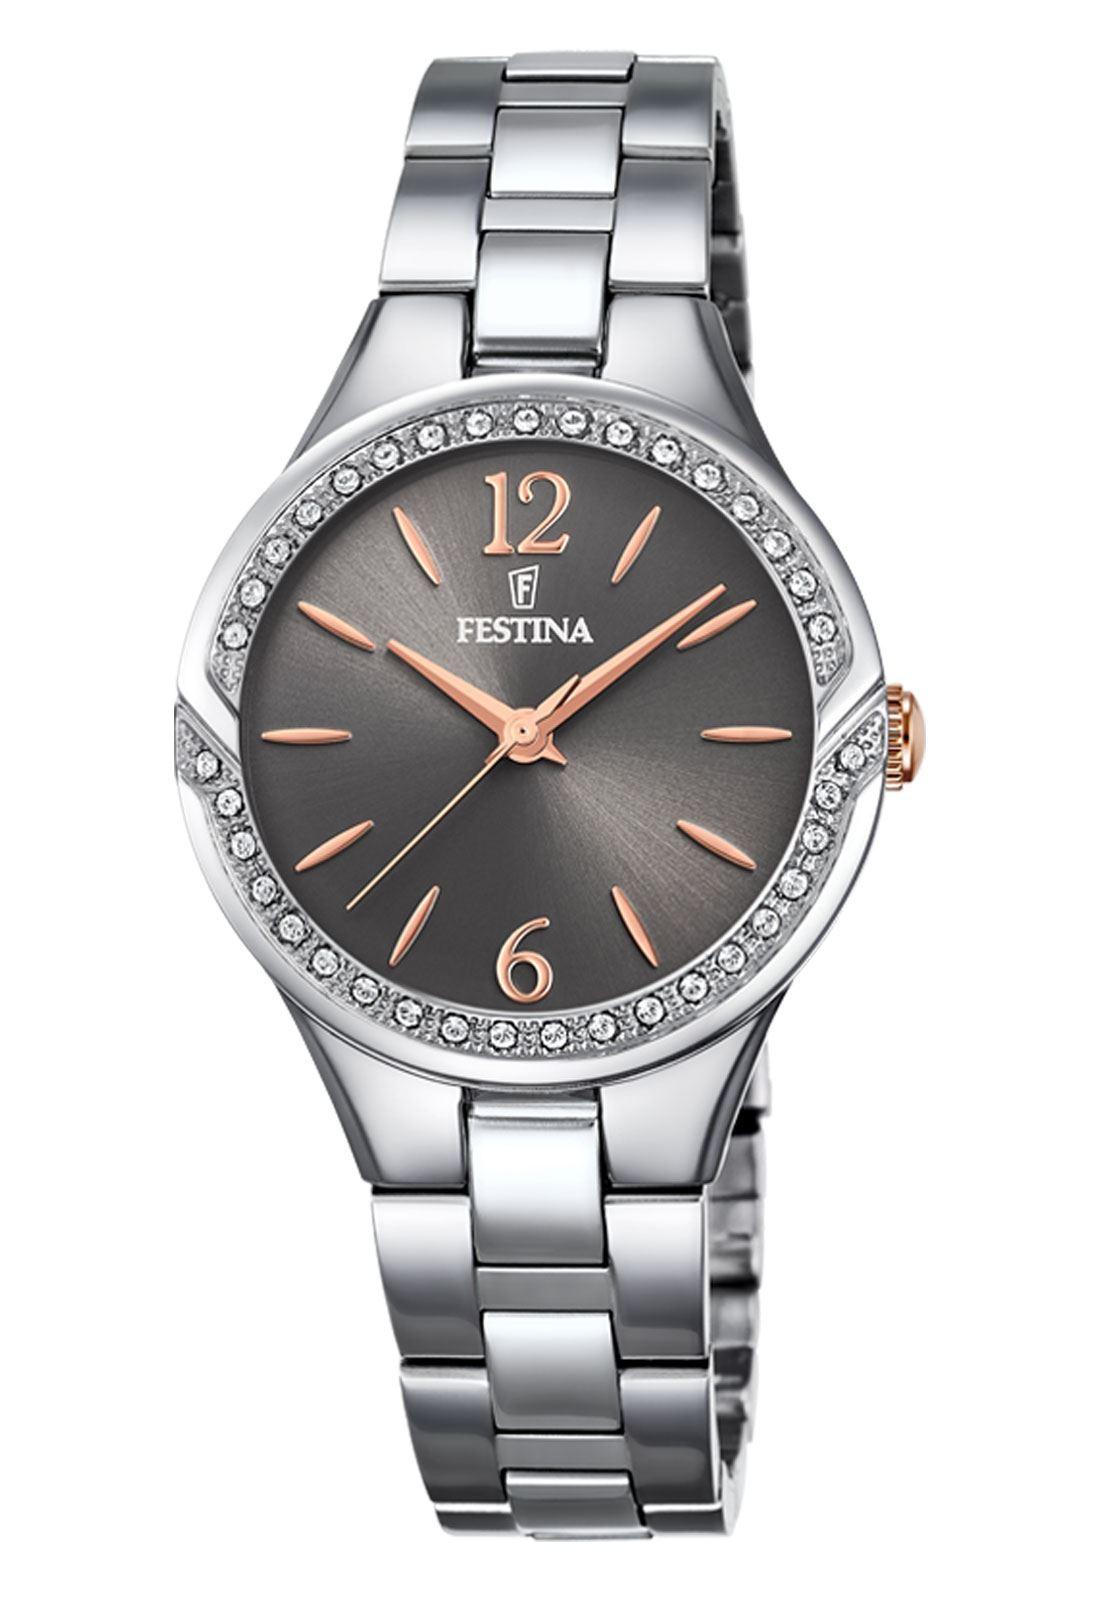 38e7281b3868 Reloj F20246 2 Plateado Festina Mujer Mademoiselle